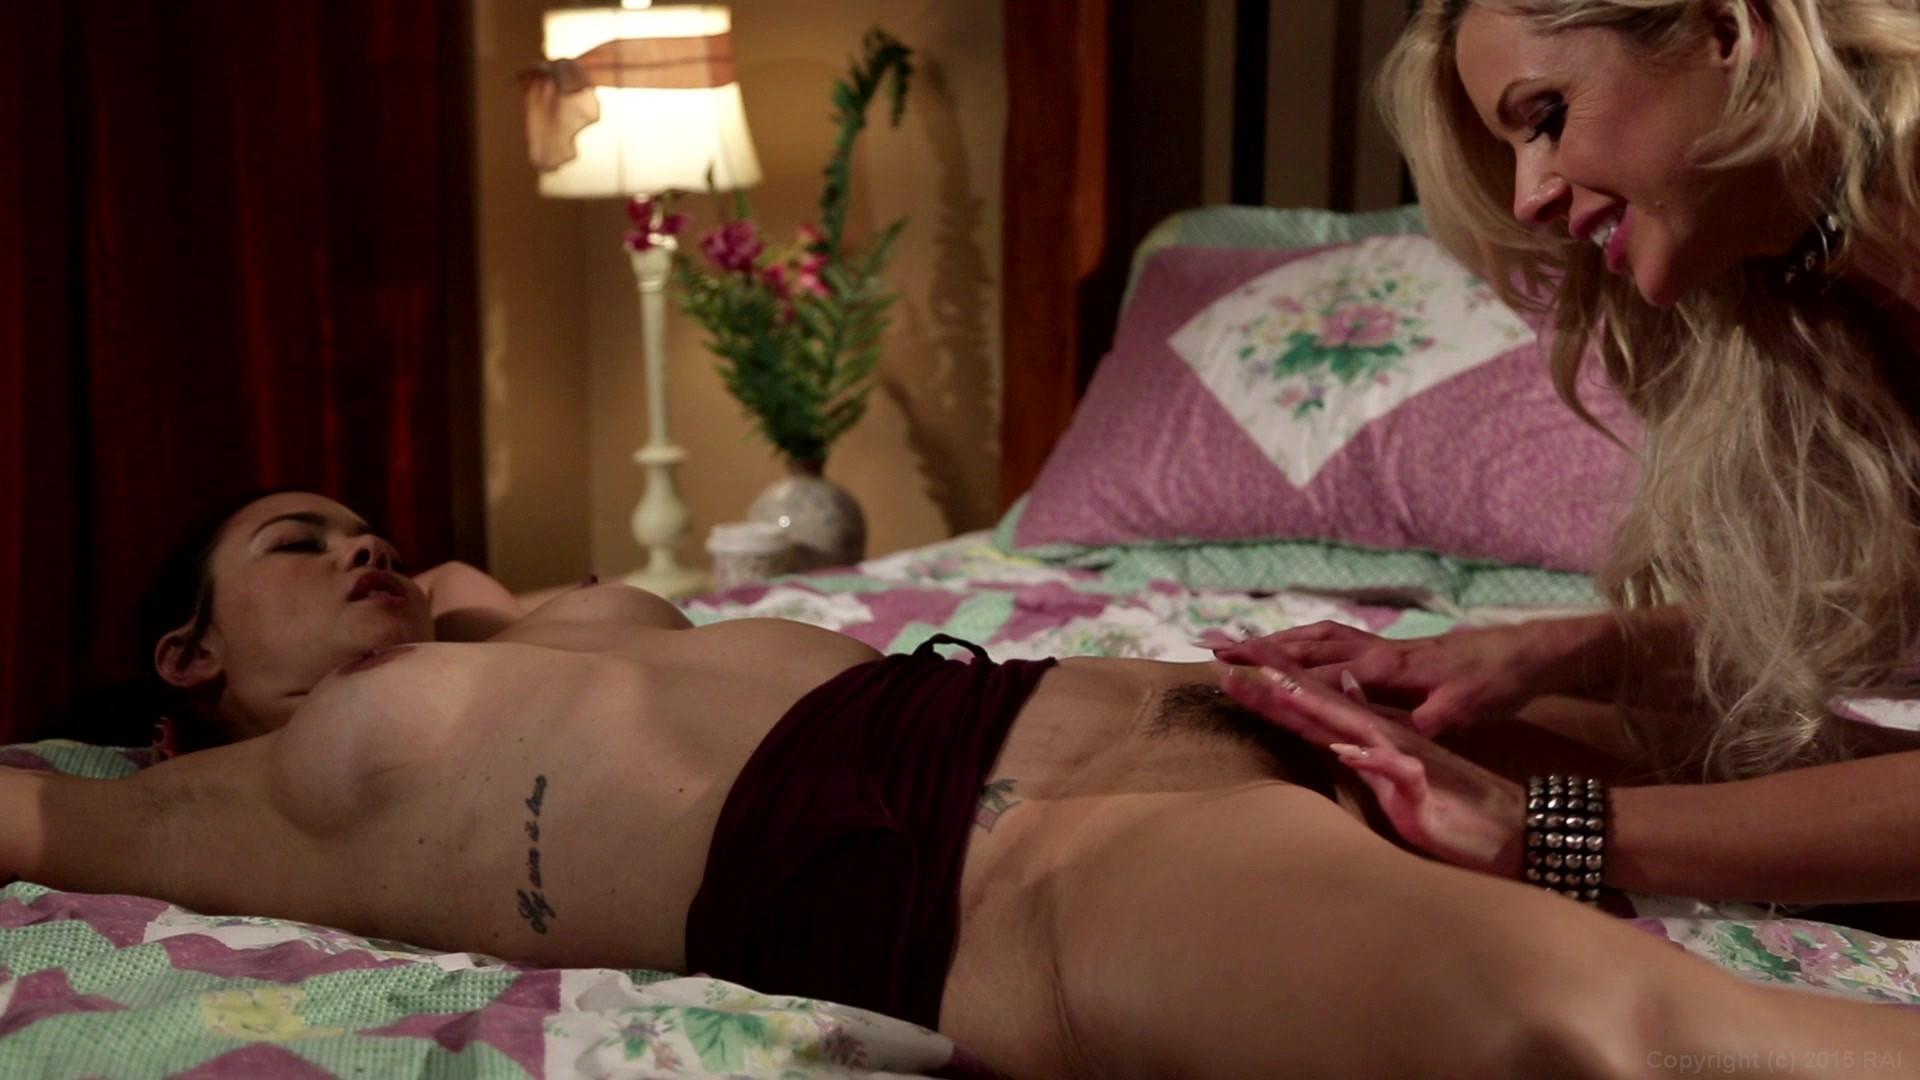 Lesbian Babysitters 13 2015  Adult Dvd Empire-7389